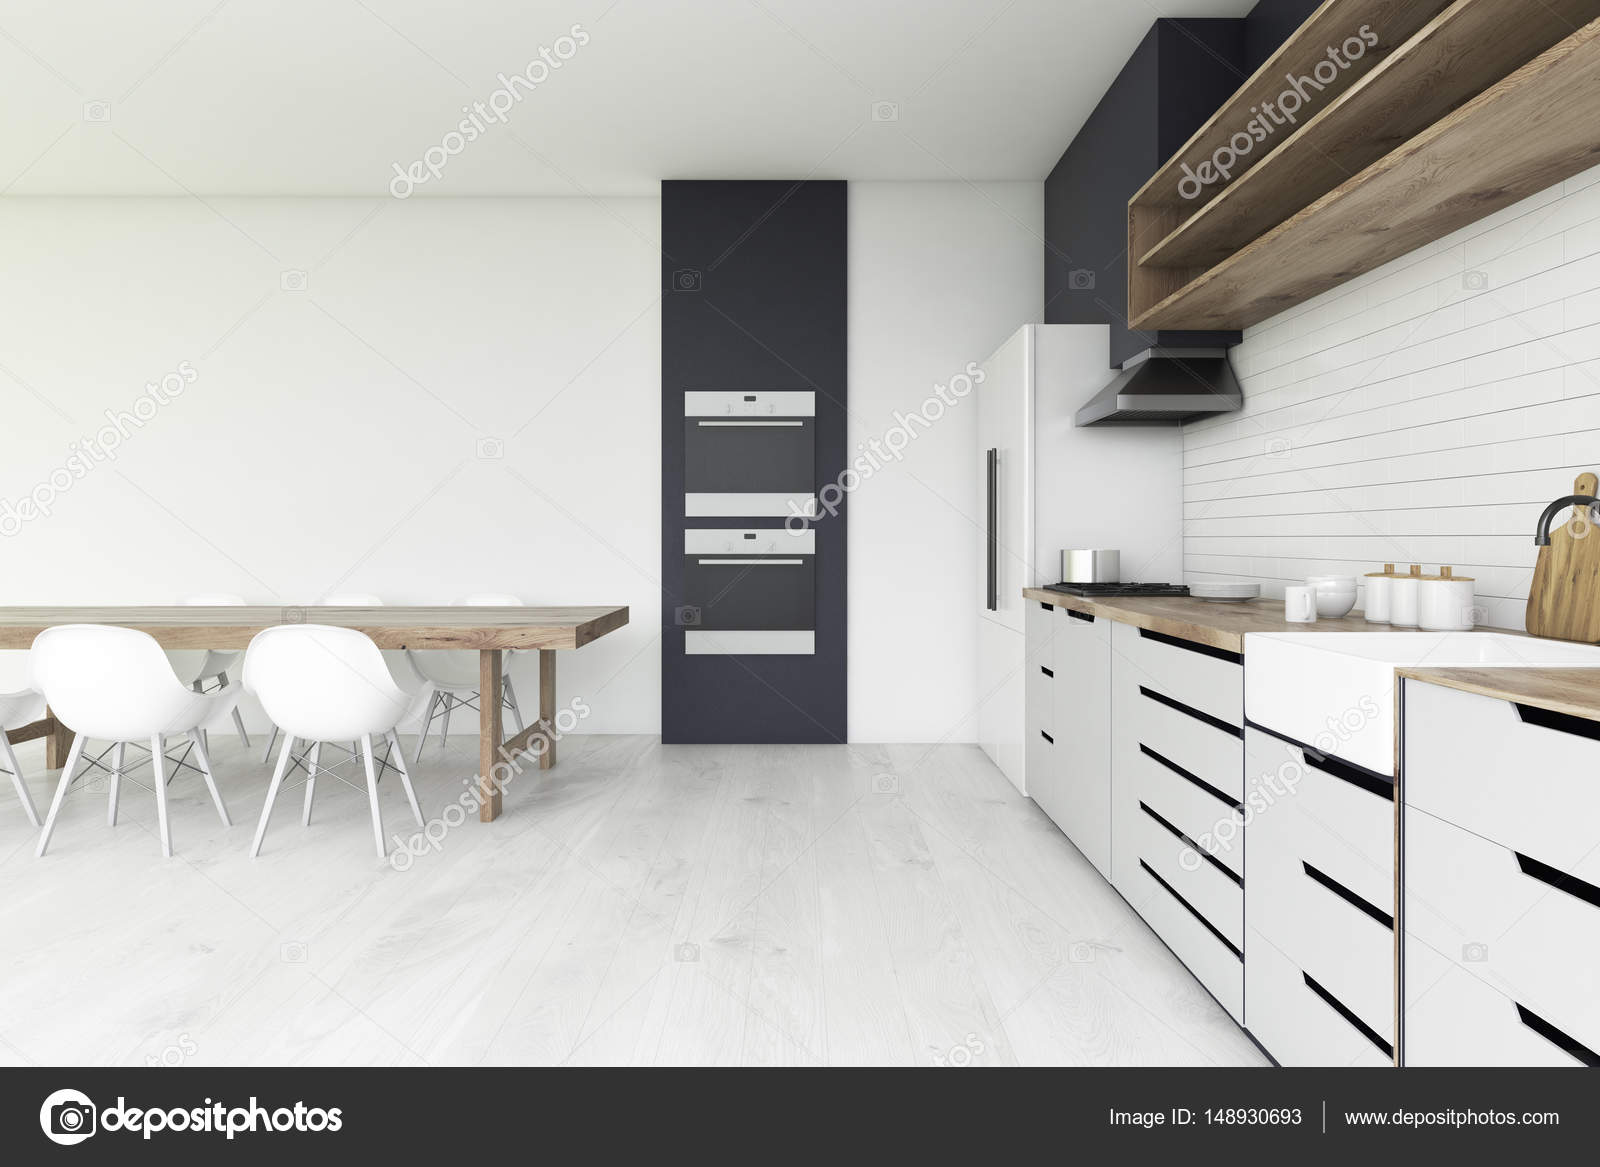 Dos horno de la cocina, piso de concreto — Foto de stock ...